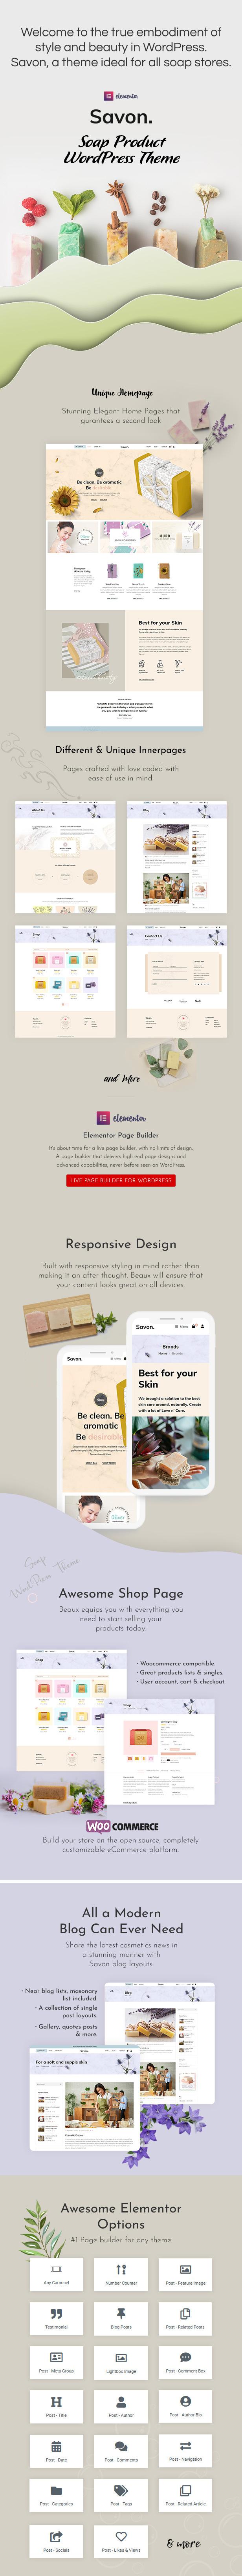 Savon - Handmade Soap, Cosmetics Beauty Shopify Theme - 1